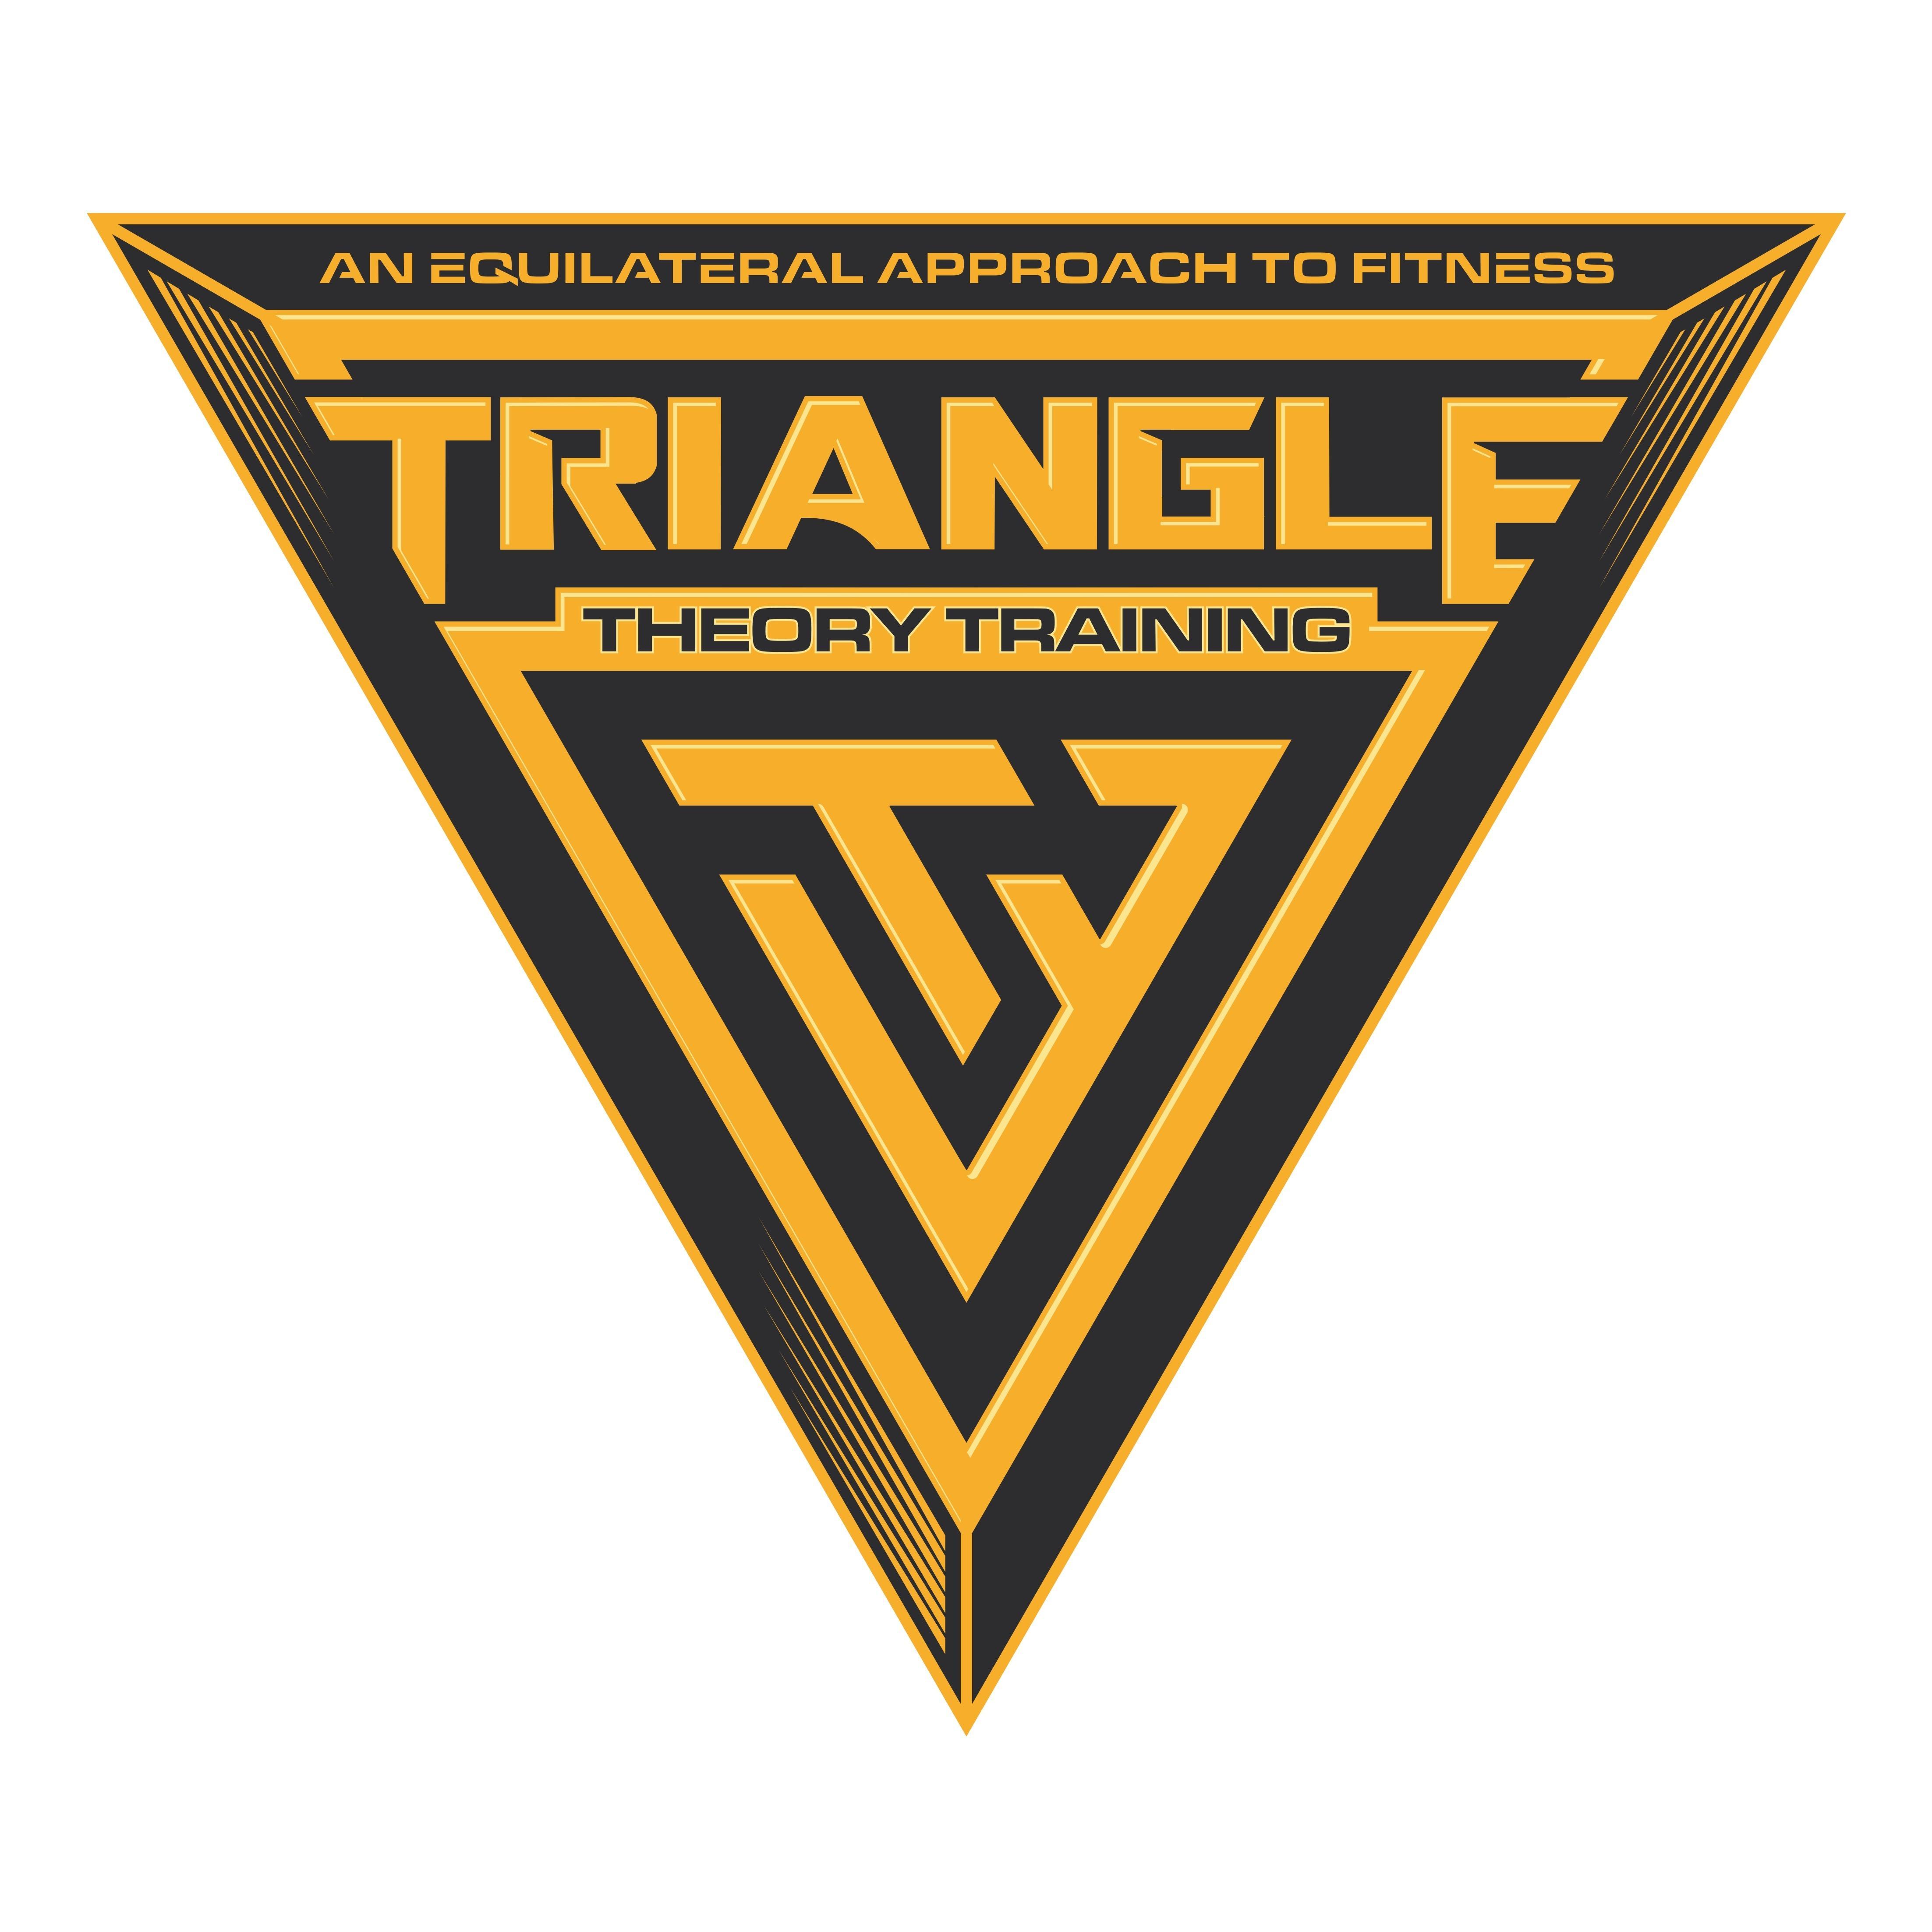 Triangle Theory Training